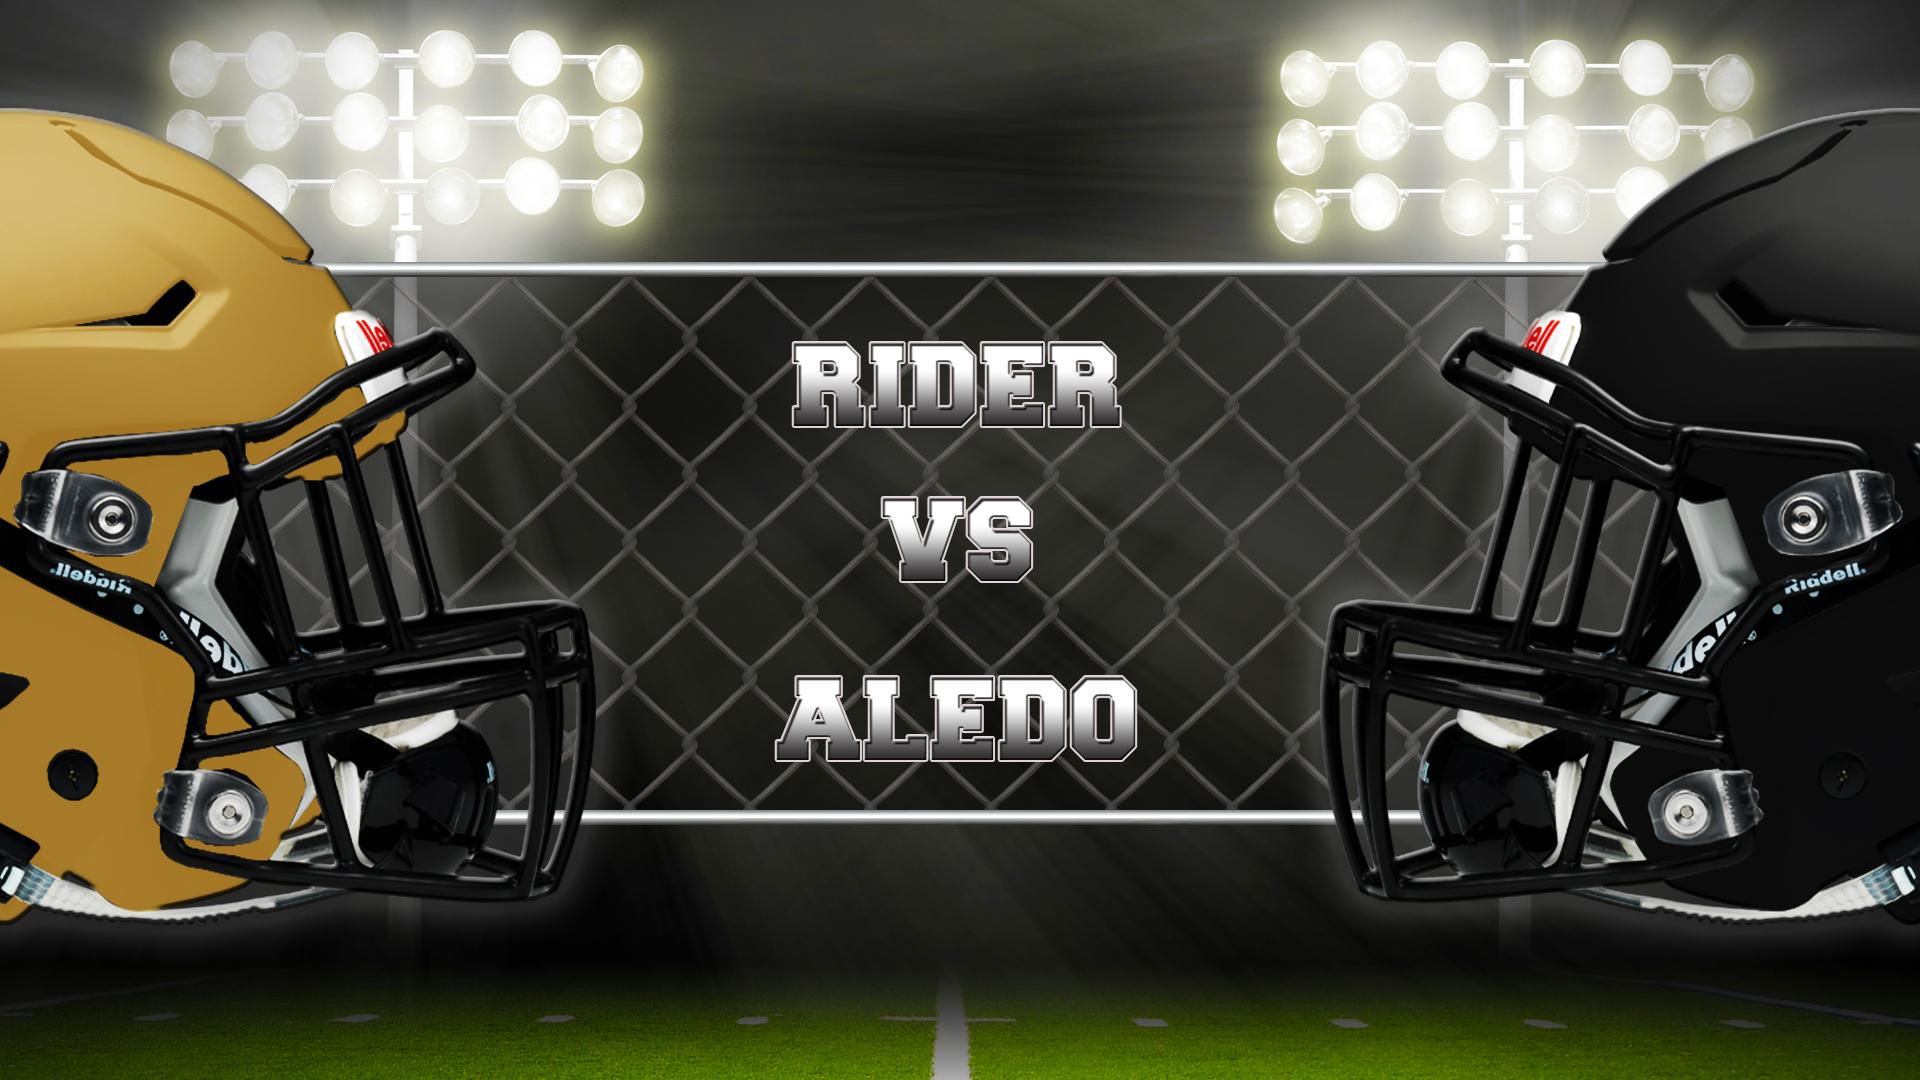 Rider vs Aledo_1478873058950.jpg